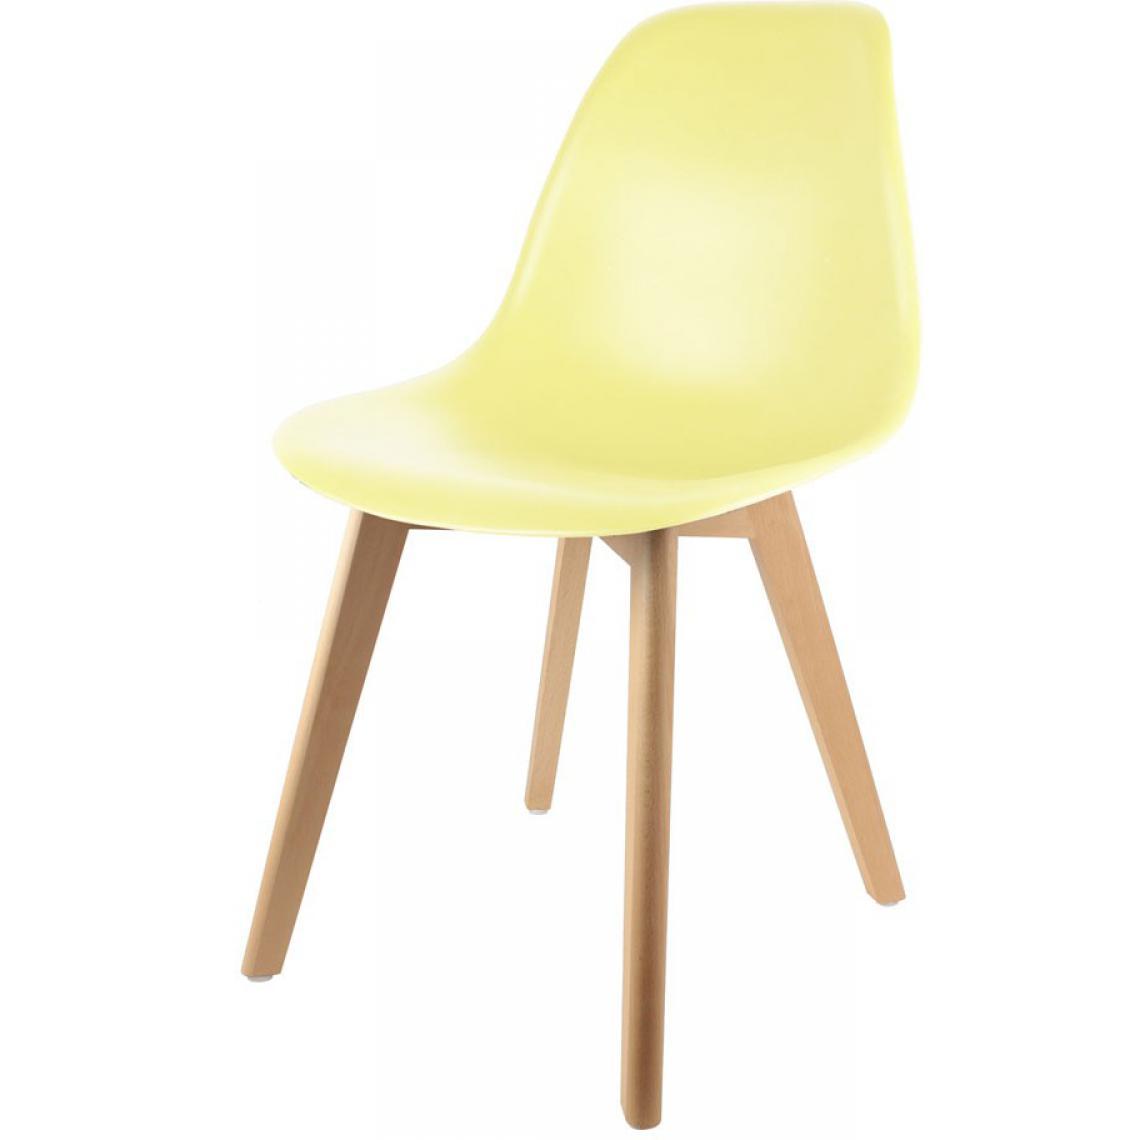 chaise scandinave coque jaune pastel fjord 3suisses. Black Bedroom Furniture Sets. Home Design Ideas